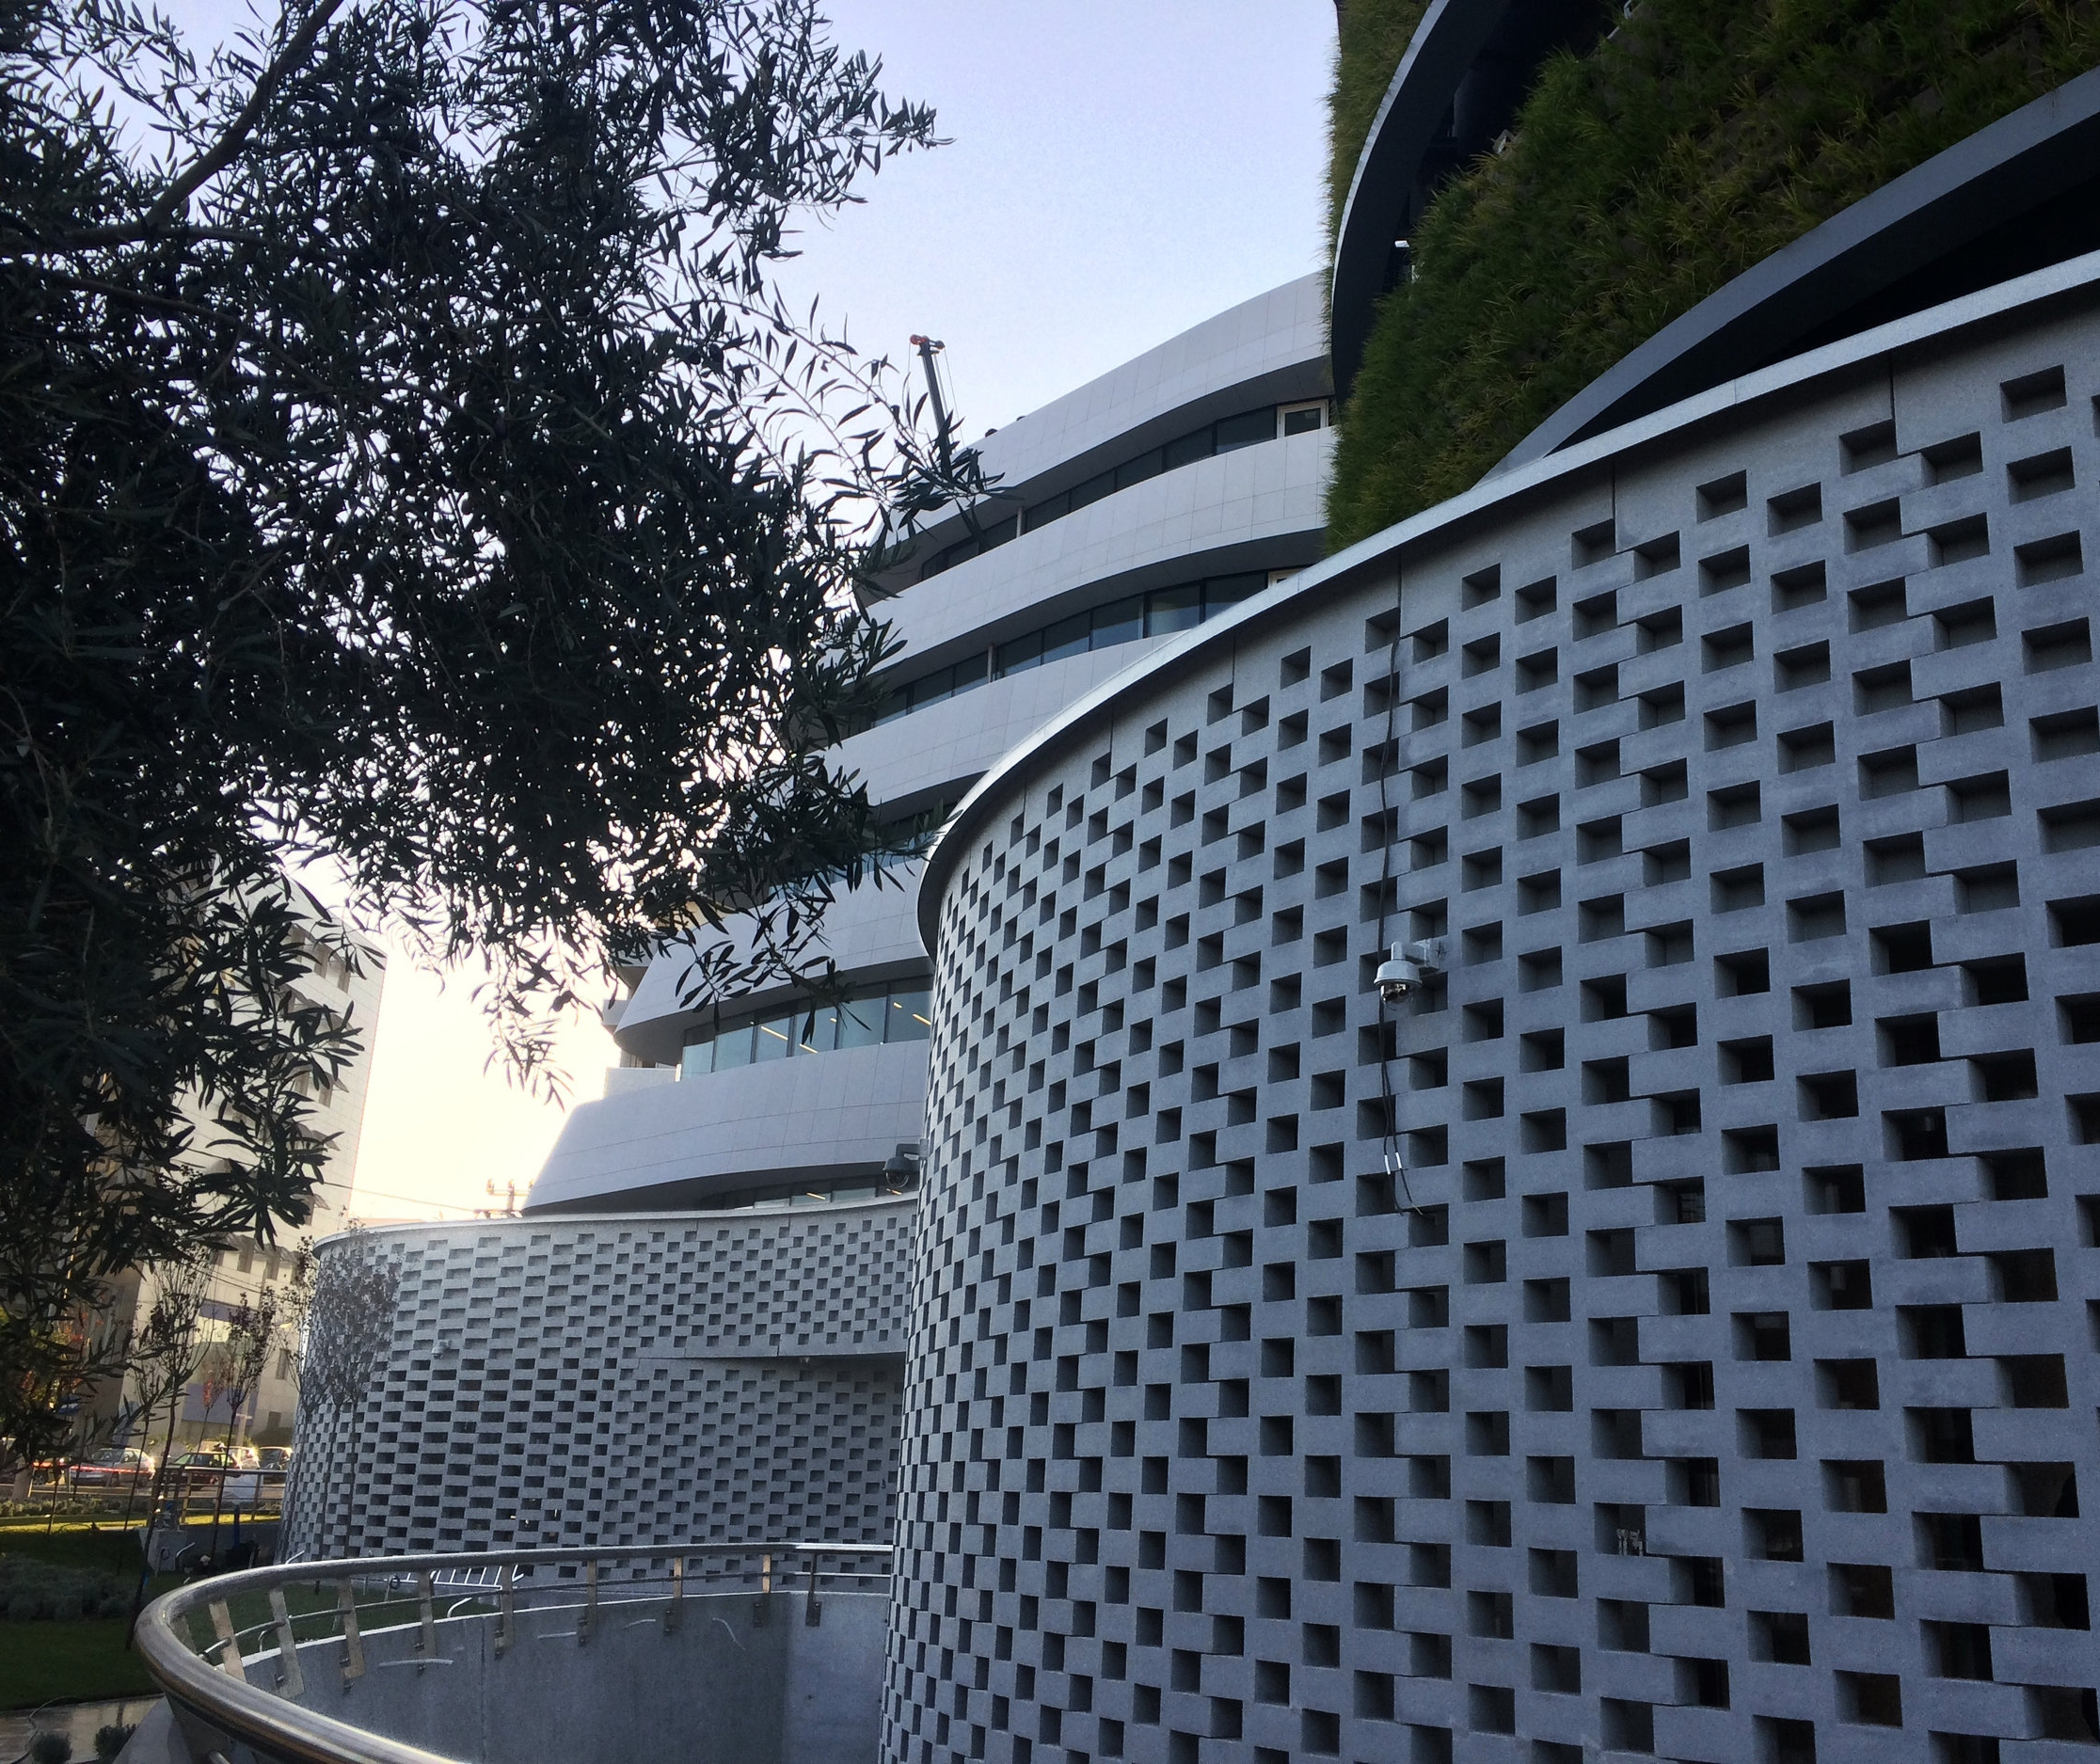 ....ArchitecturalApplications..ΑρχιτεκτονικΕς εφαρμογΕς.... -